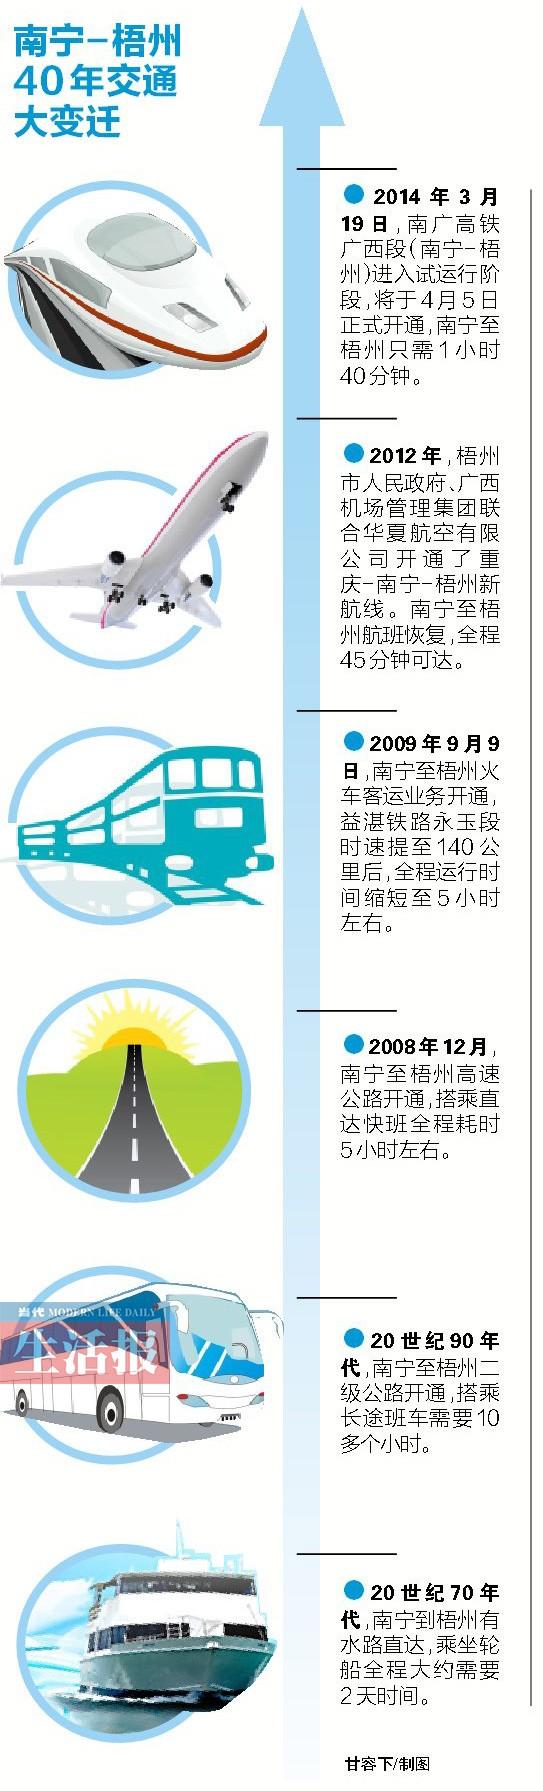 <a href=http://www.huochepiao.com/guihua/nanguang/ target=_blank>南广高铁</a>广西段19日试运行 4月5日可乘<a href=http://www.huochepiao.com/dongche/ target=_blank>动车</a>到梧州